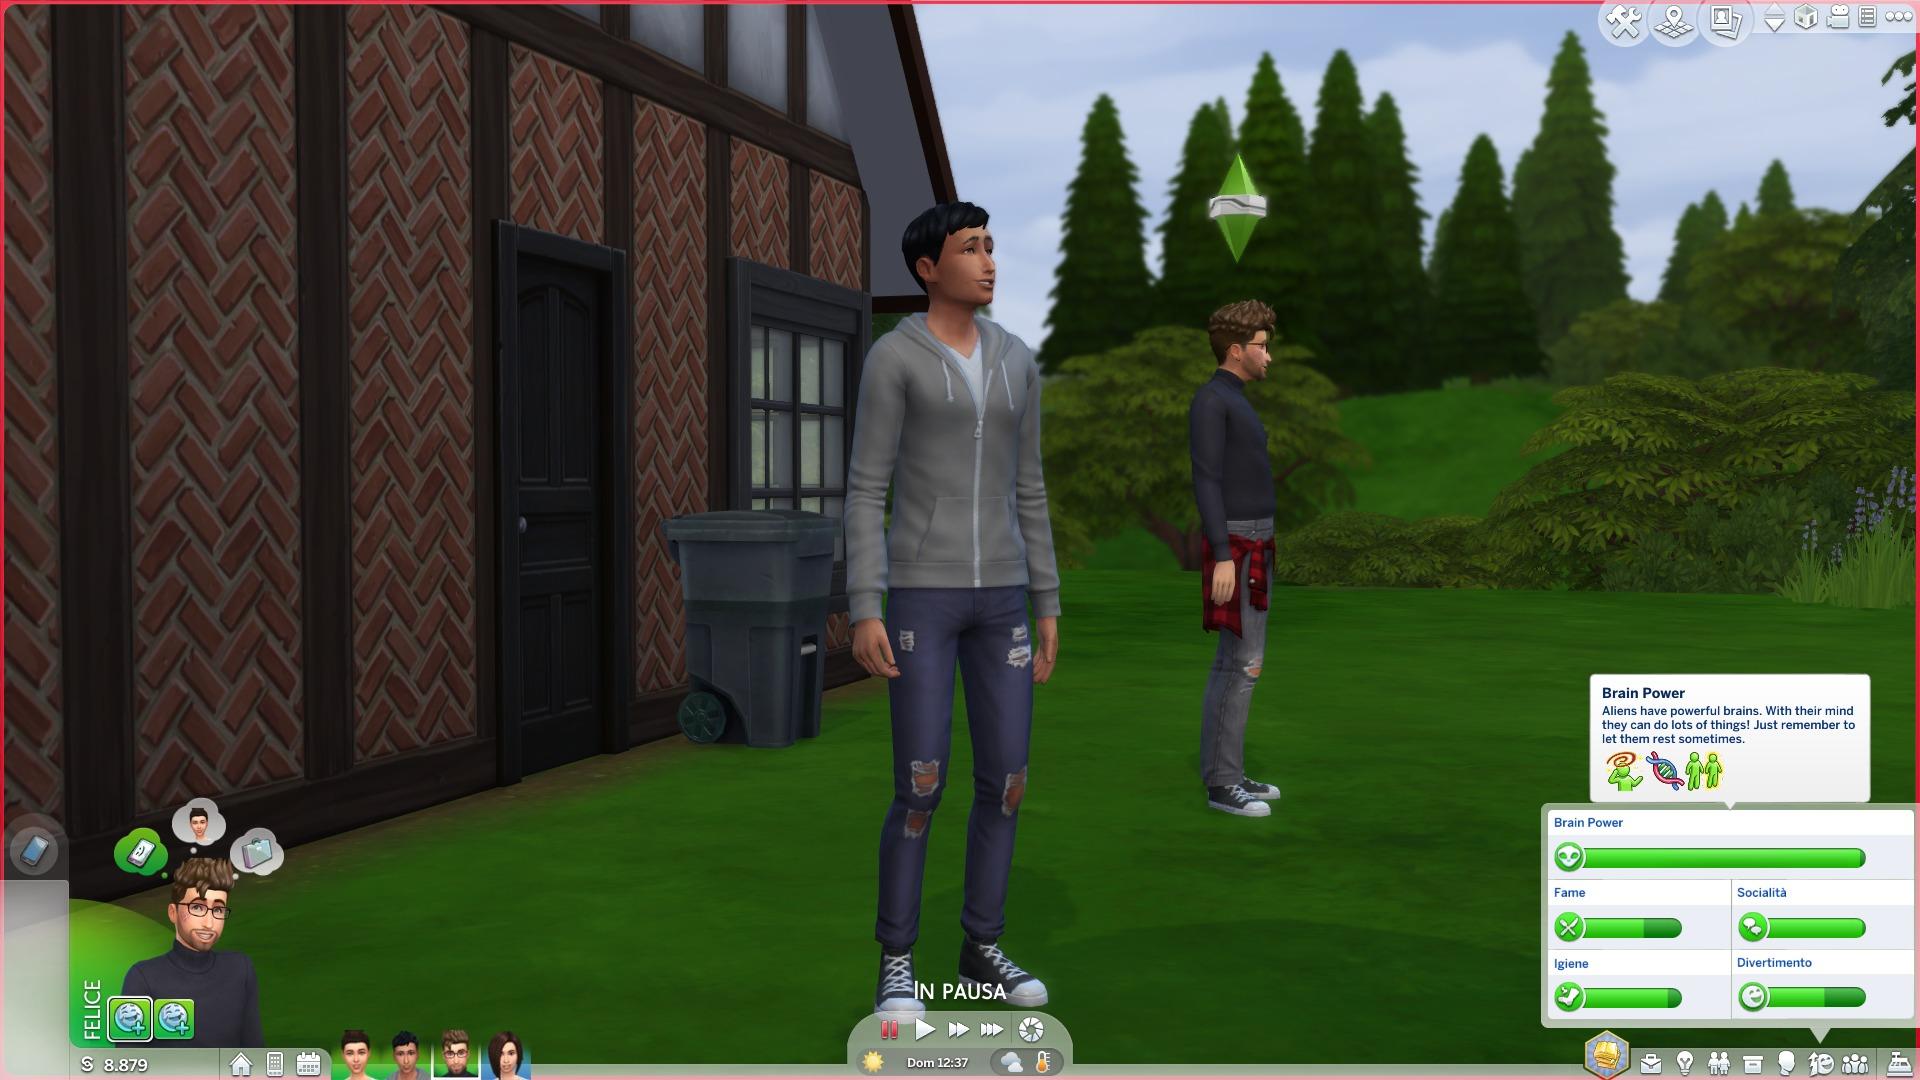 Mod The Sims - Enhanced Aliens Mod V1 5 [KINDA WORKS] Read